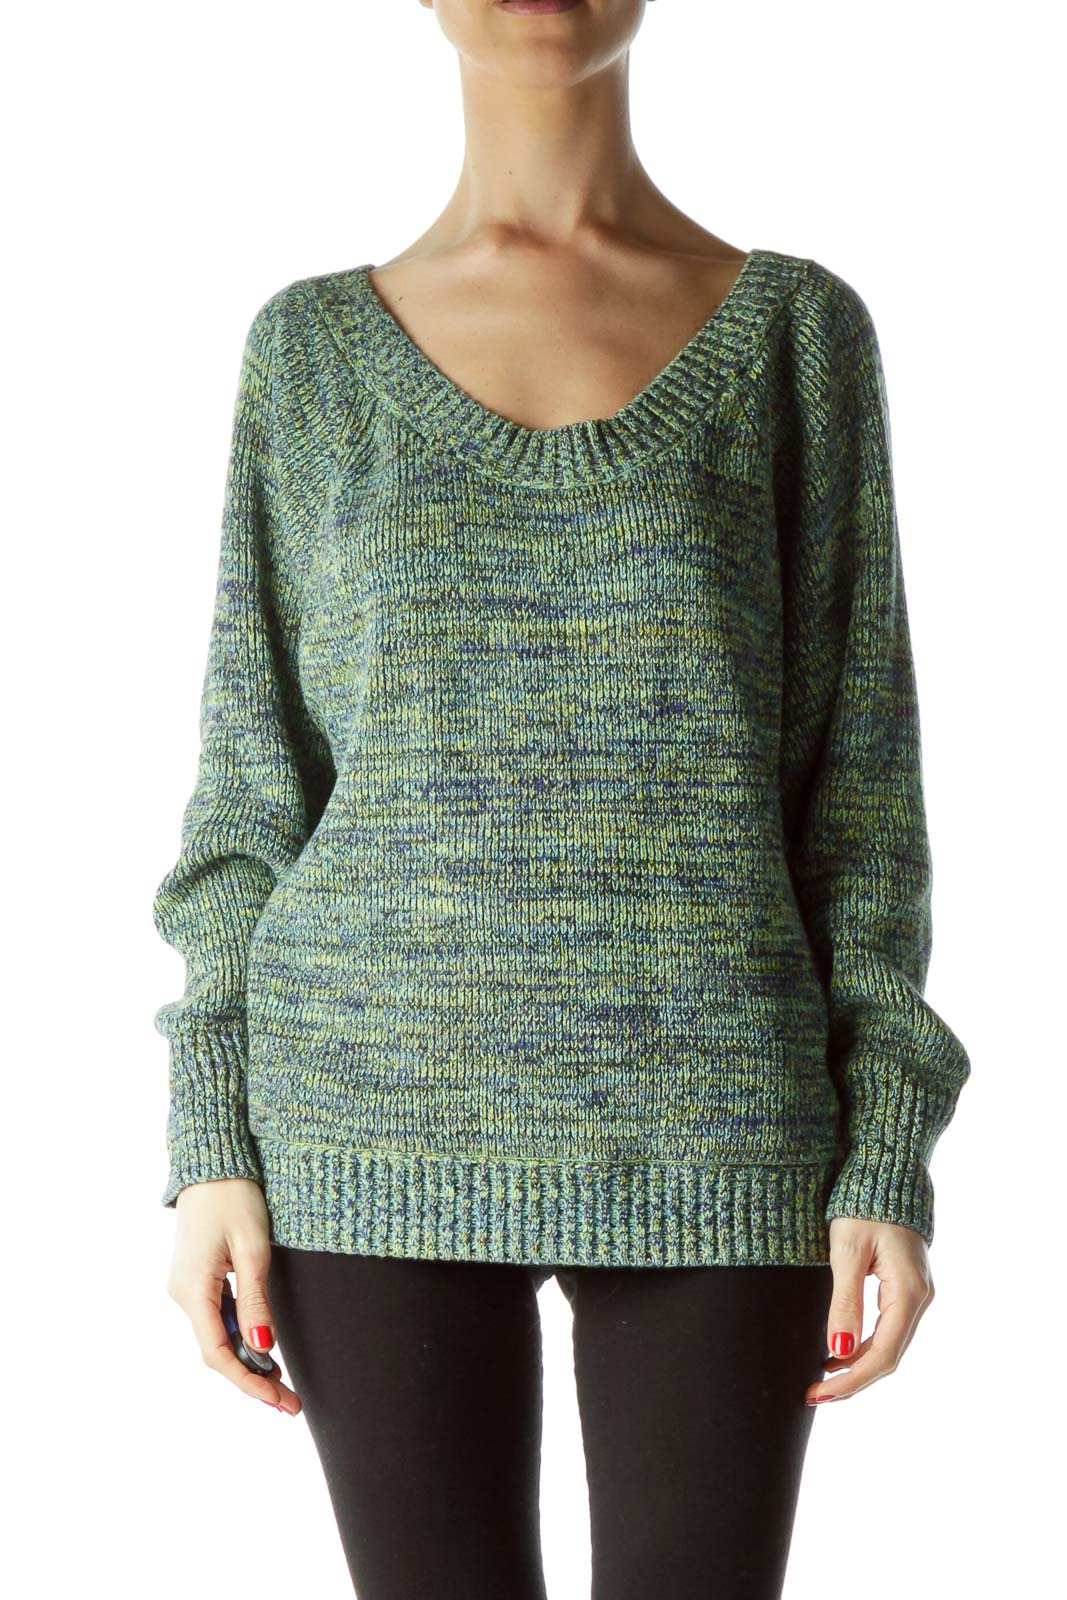 Blue Black Yellow 100% Cotton Sweater